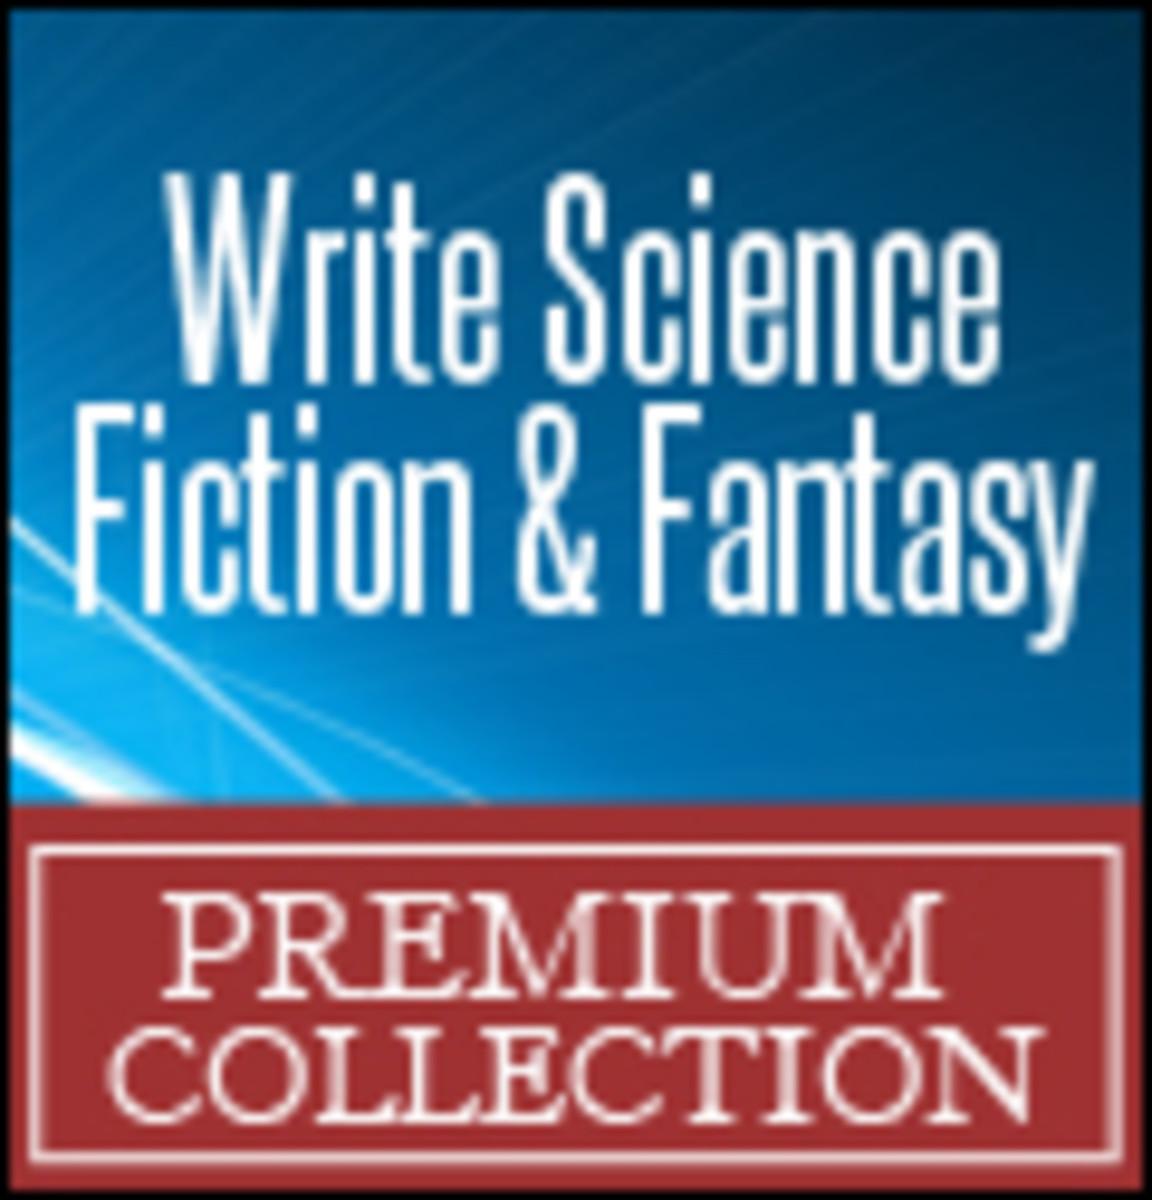 how to write science fiction | how to write a fantasy novel